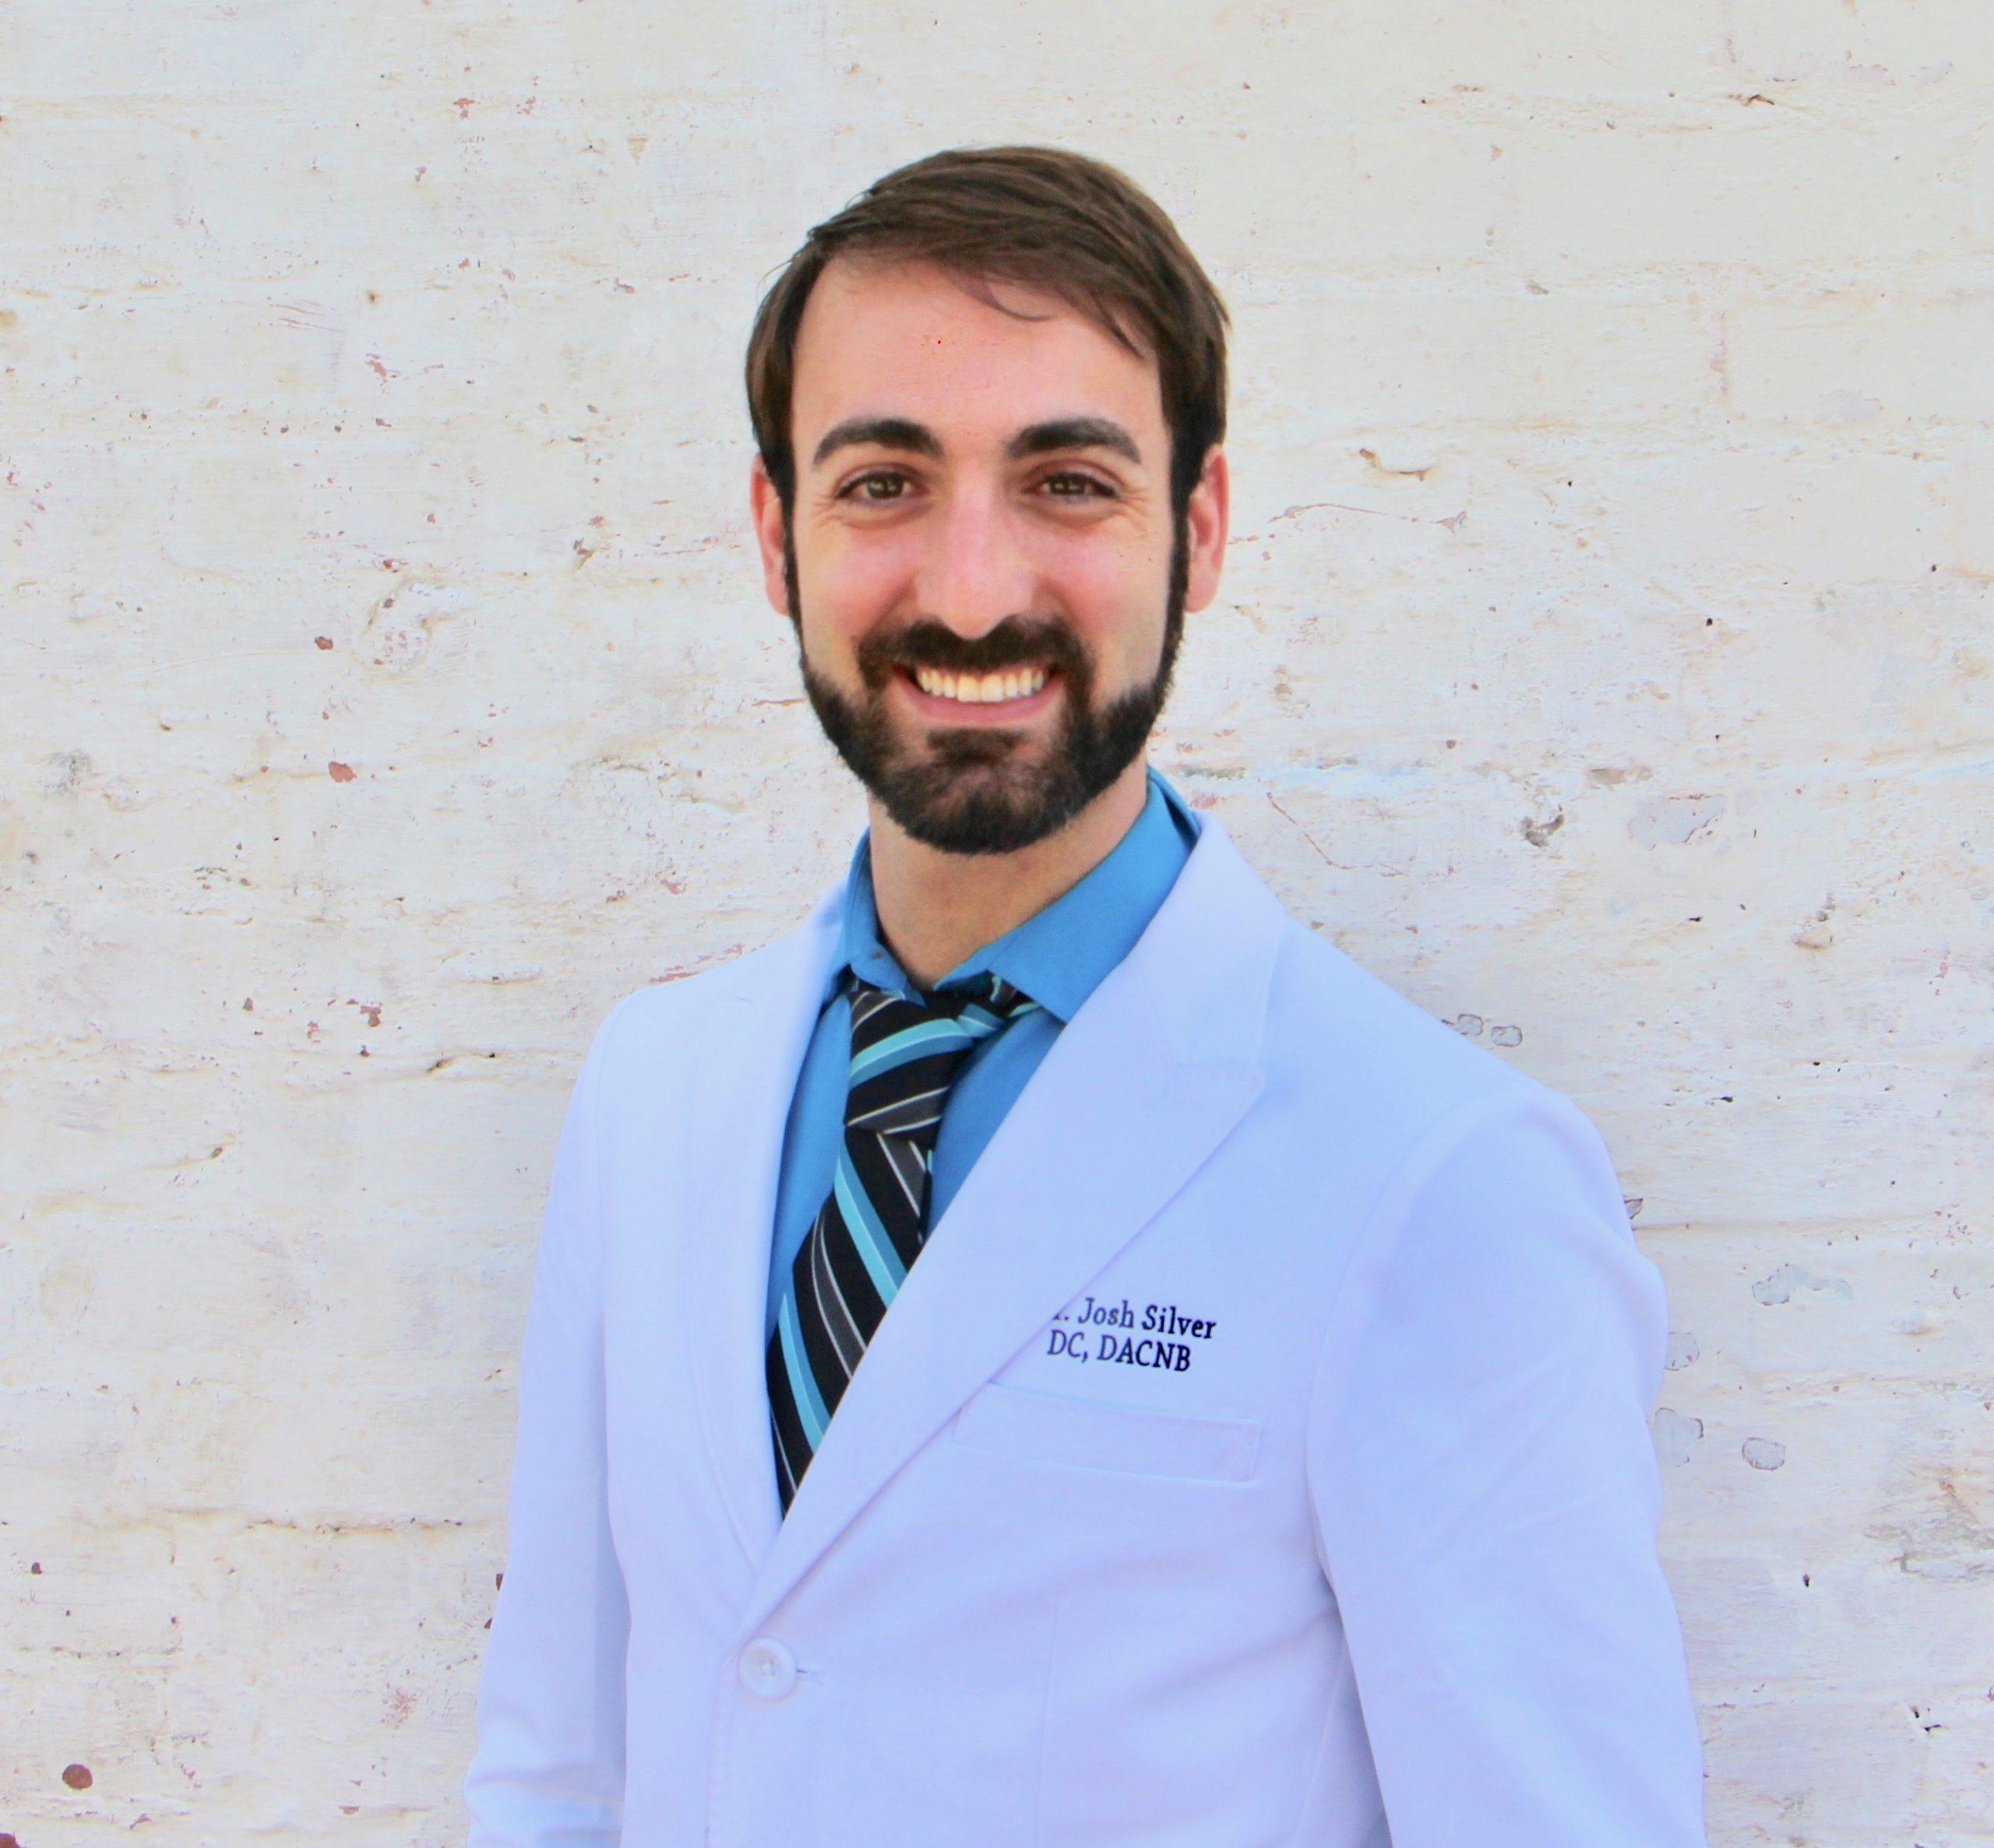 Dr. Adam Harcourt